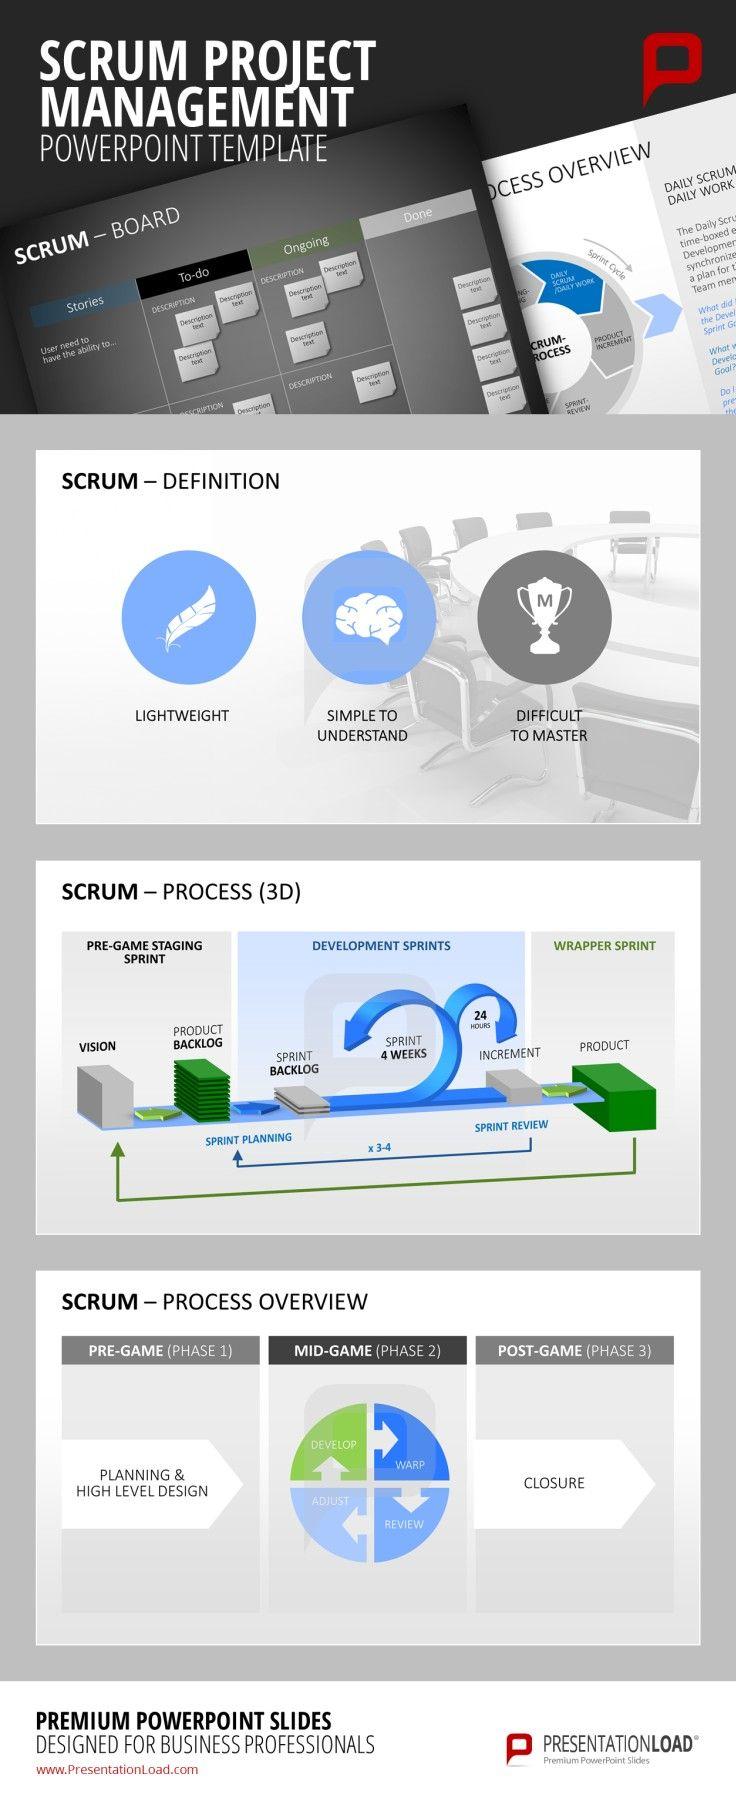 Scrum project management PowerPoint templates  #presentationload  http://www.presentationload.com/scrum-toolbox-powerpoint-template.html